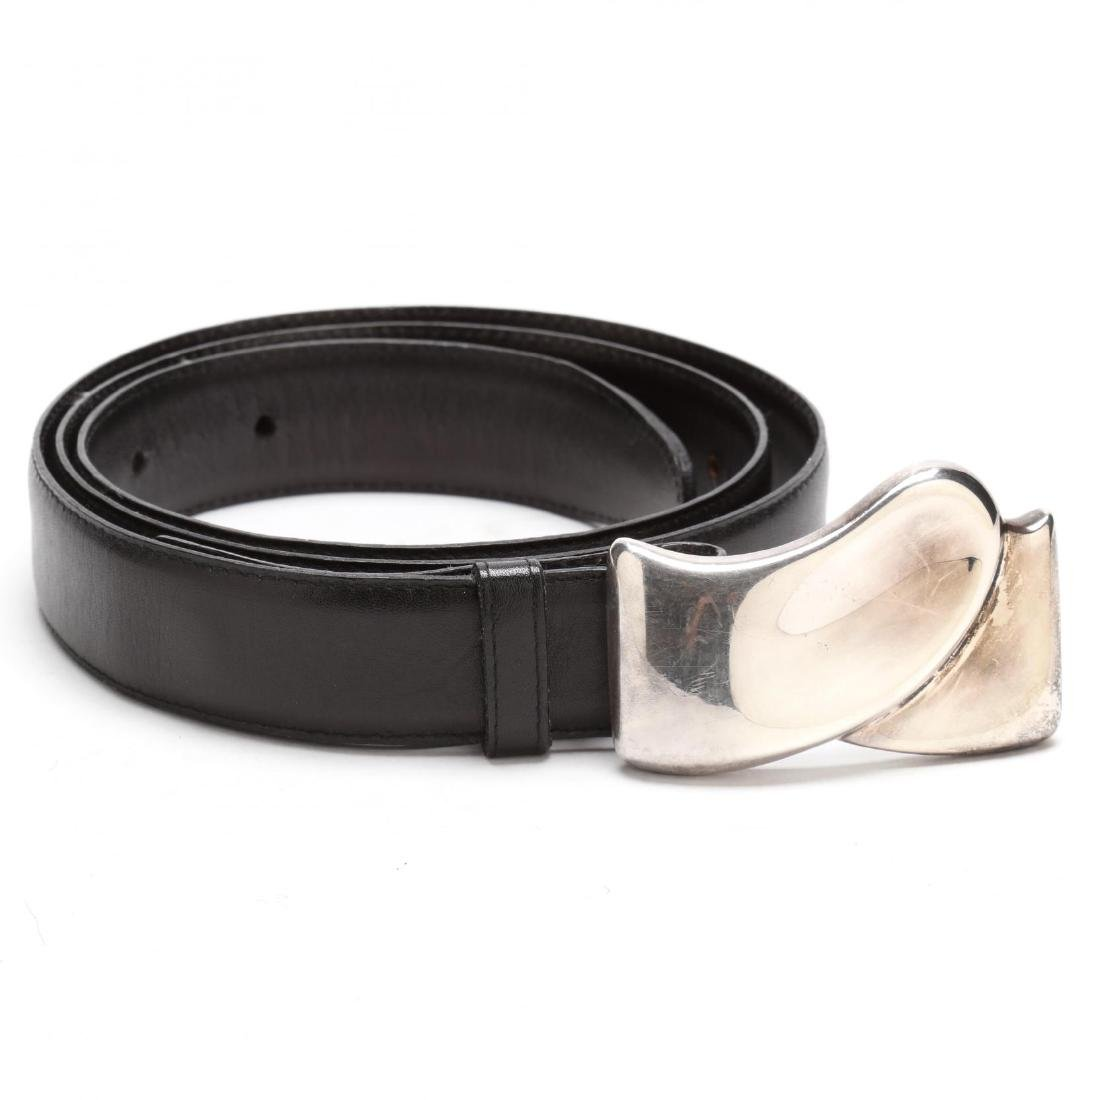 Vintage Sterling Belt, Elsa Peretti for Tiffany & Co.